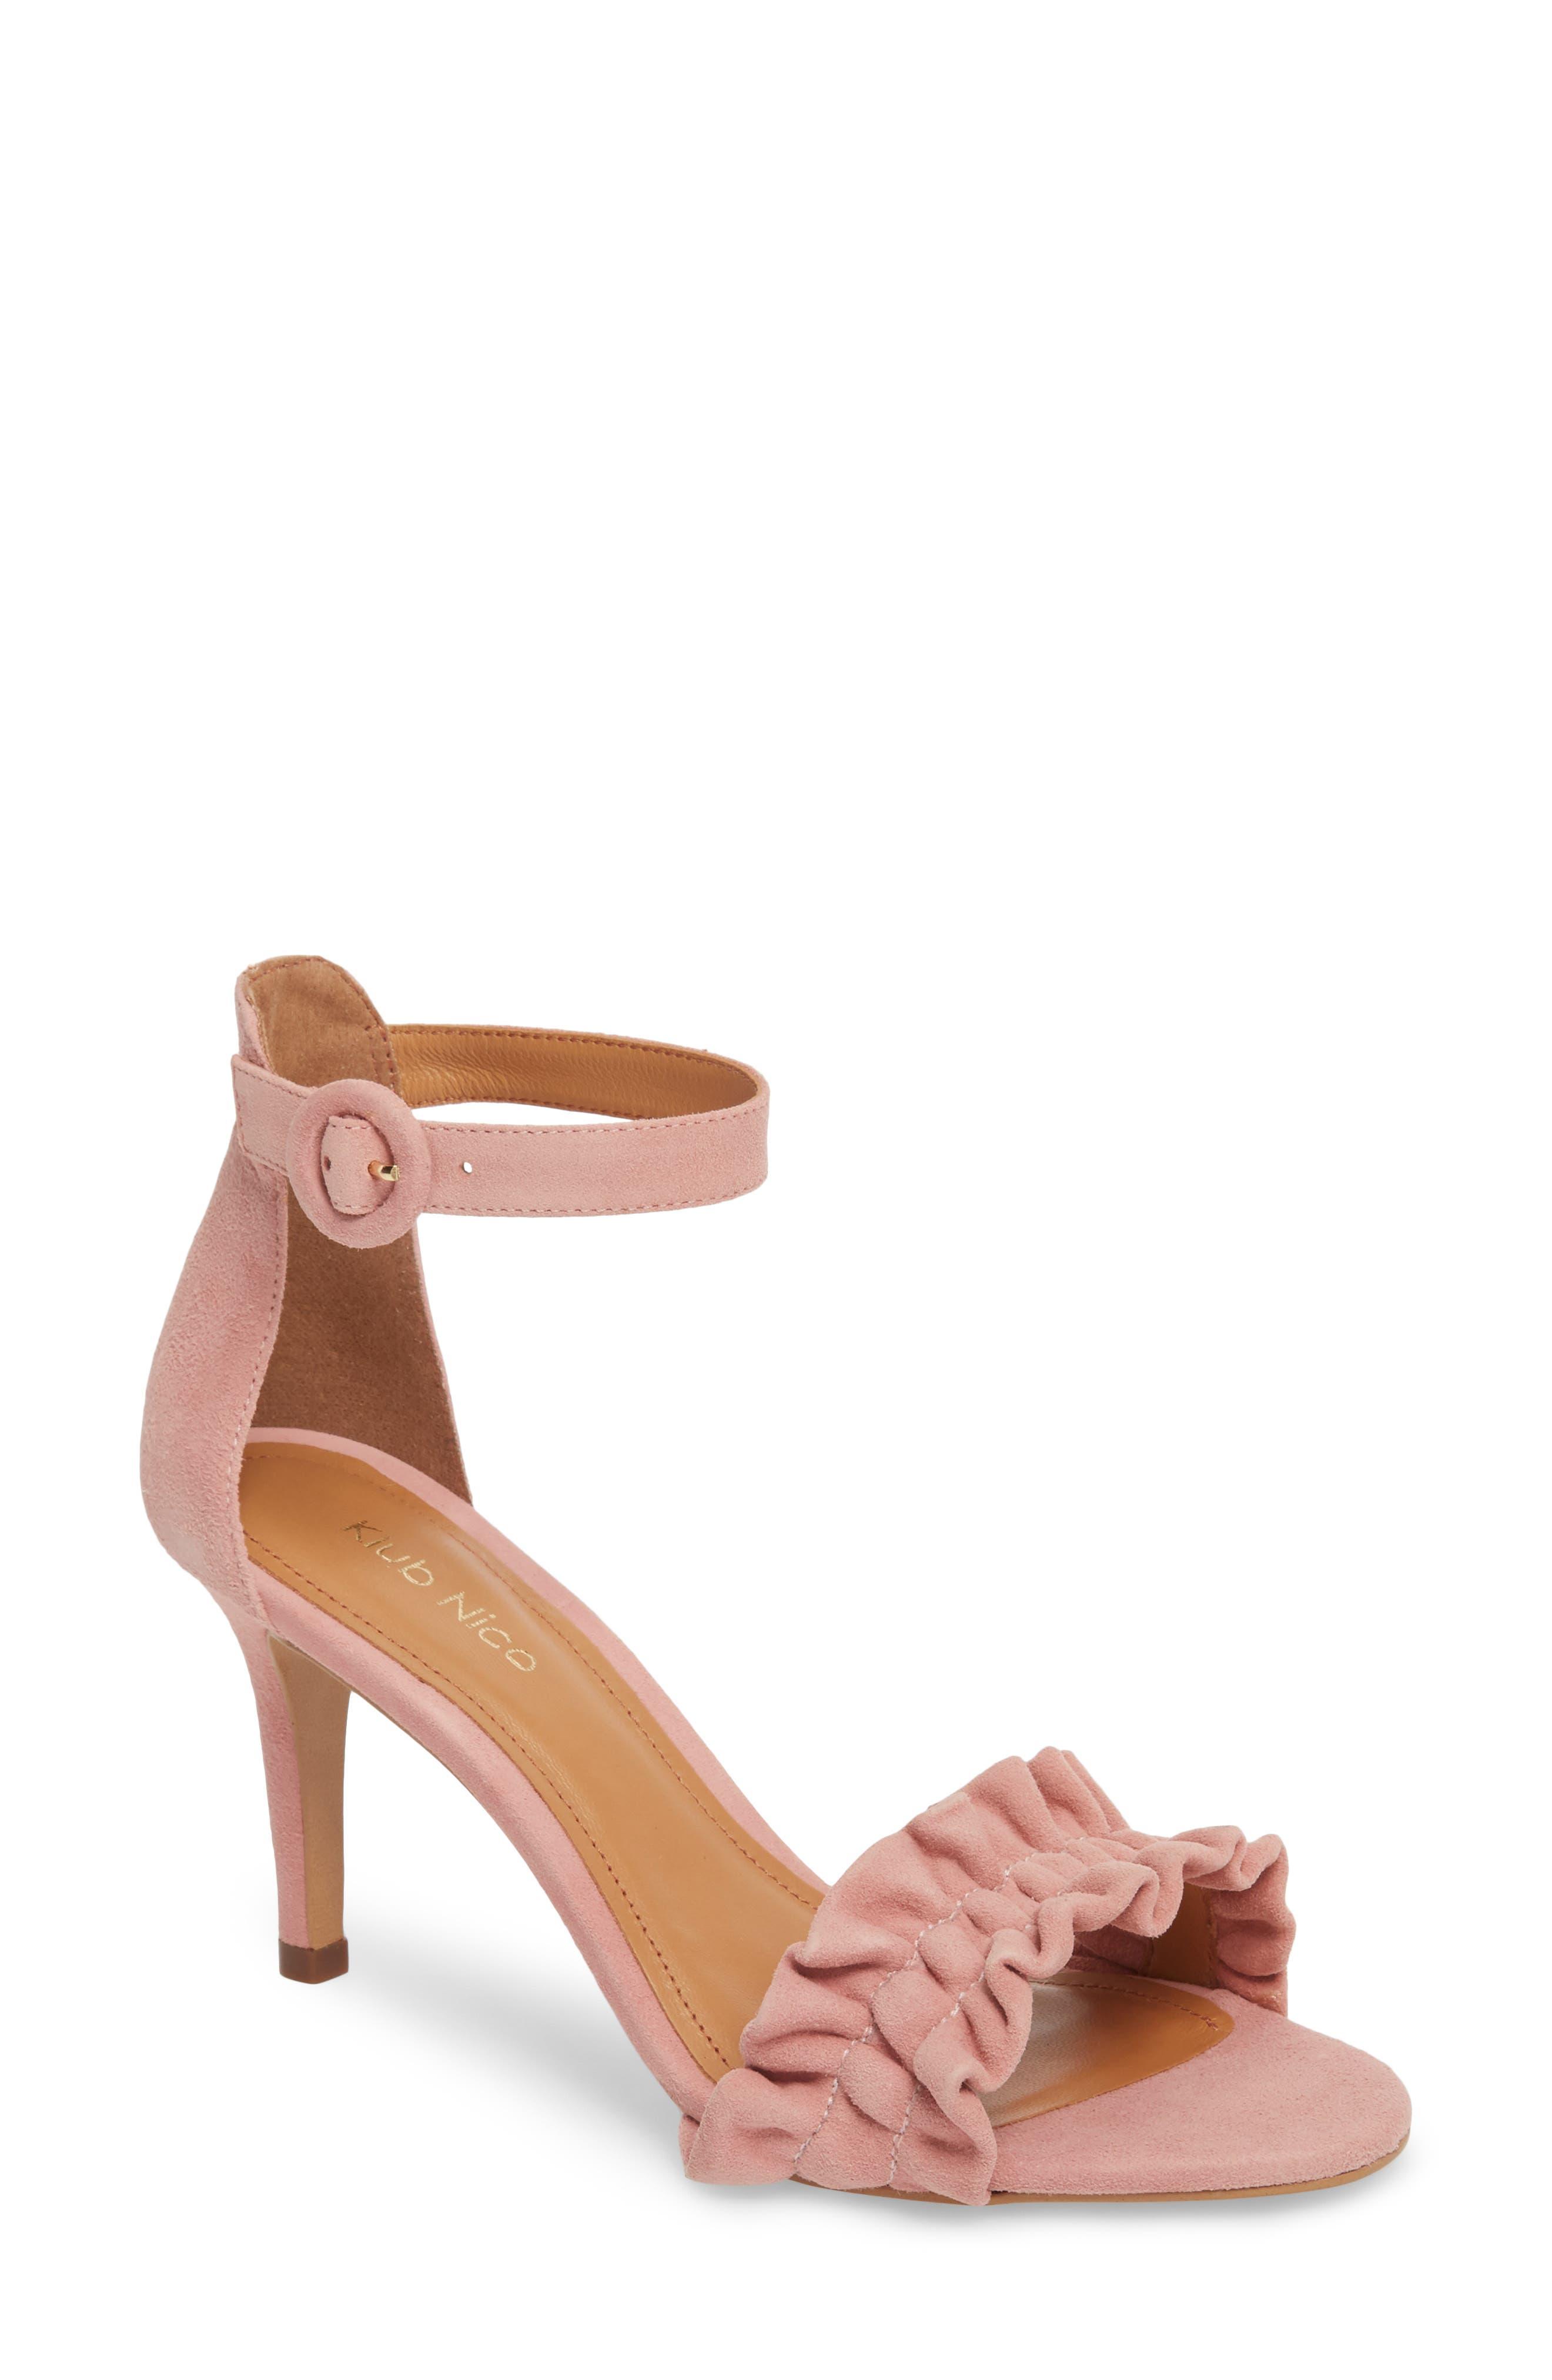 Klub Nico Arlow Sandal, Pink